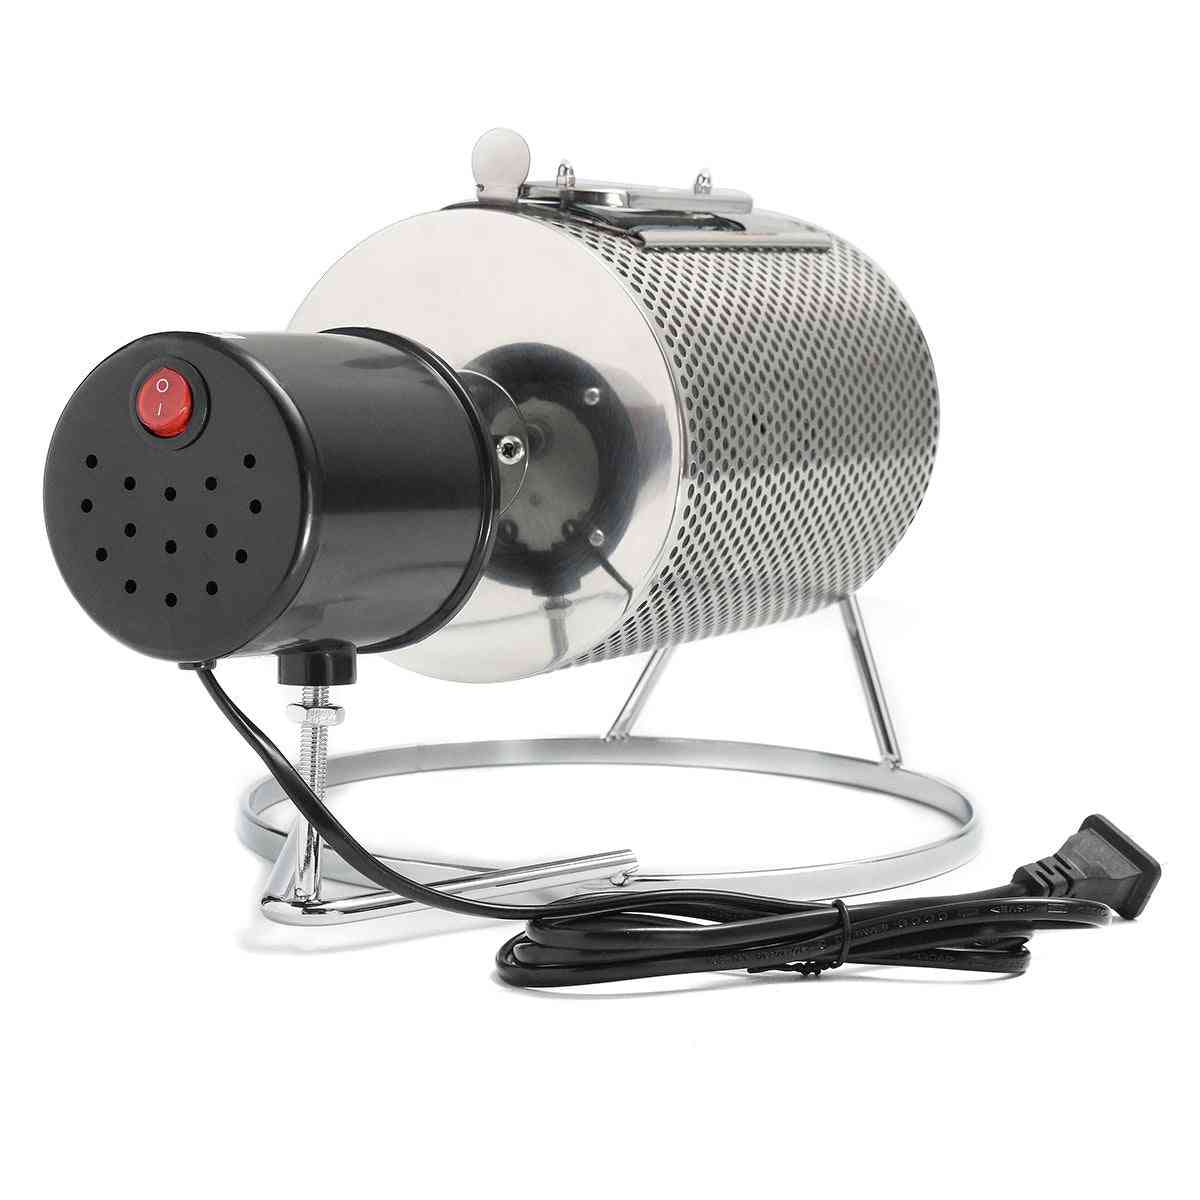 Electric Coffee Roasting Baking Tools Machine, Household Grain Drying Nut Roasters